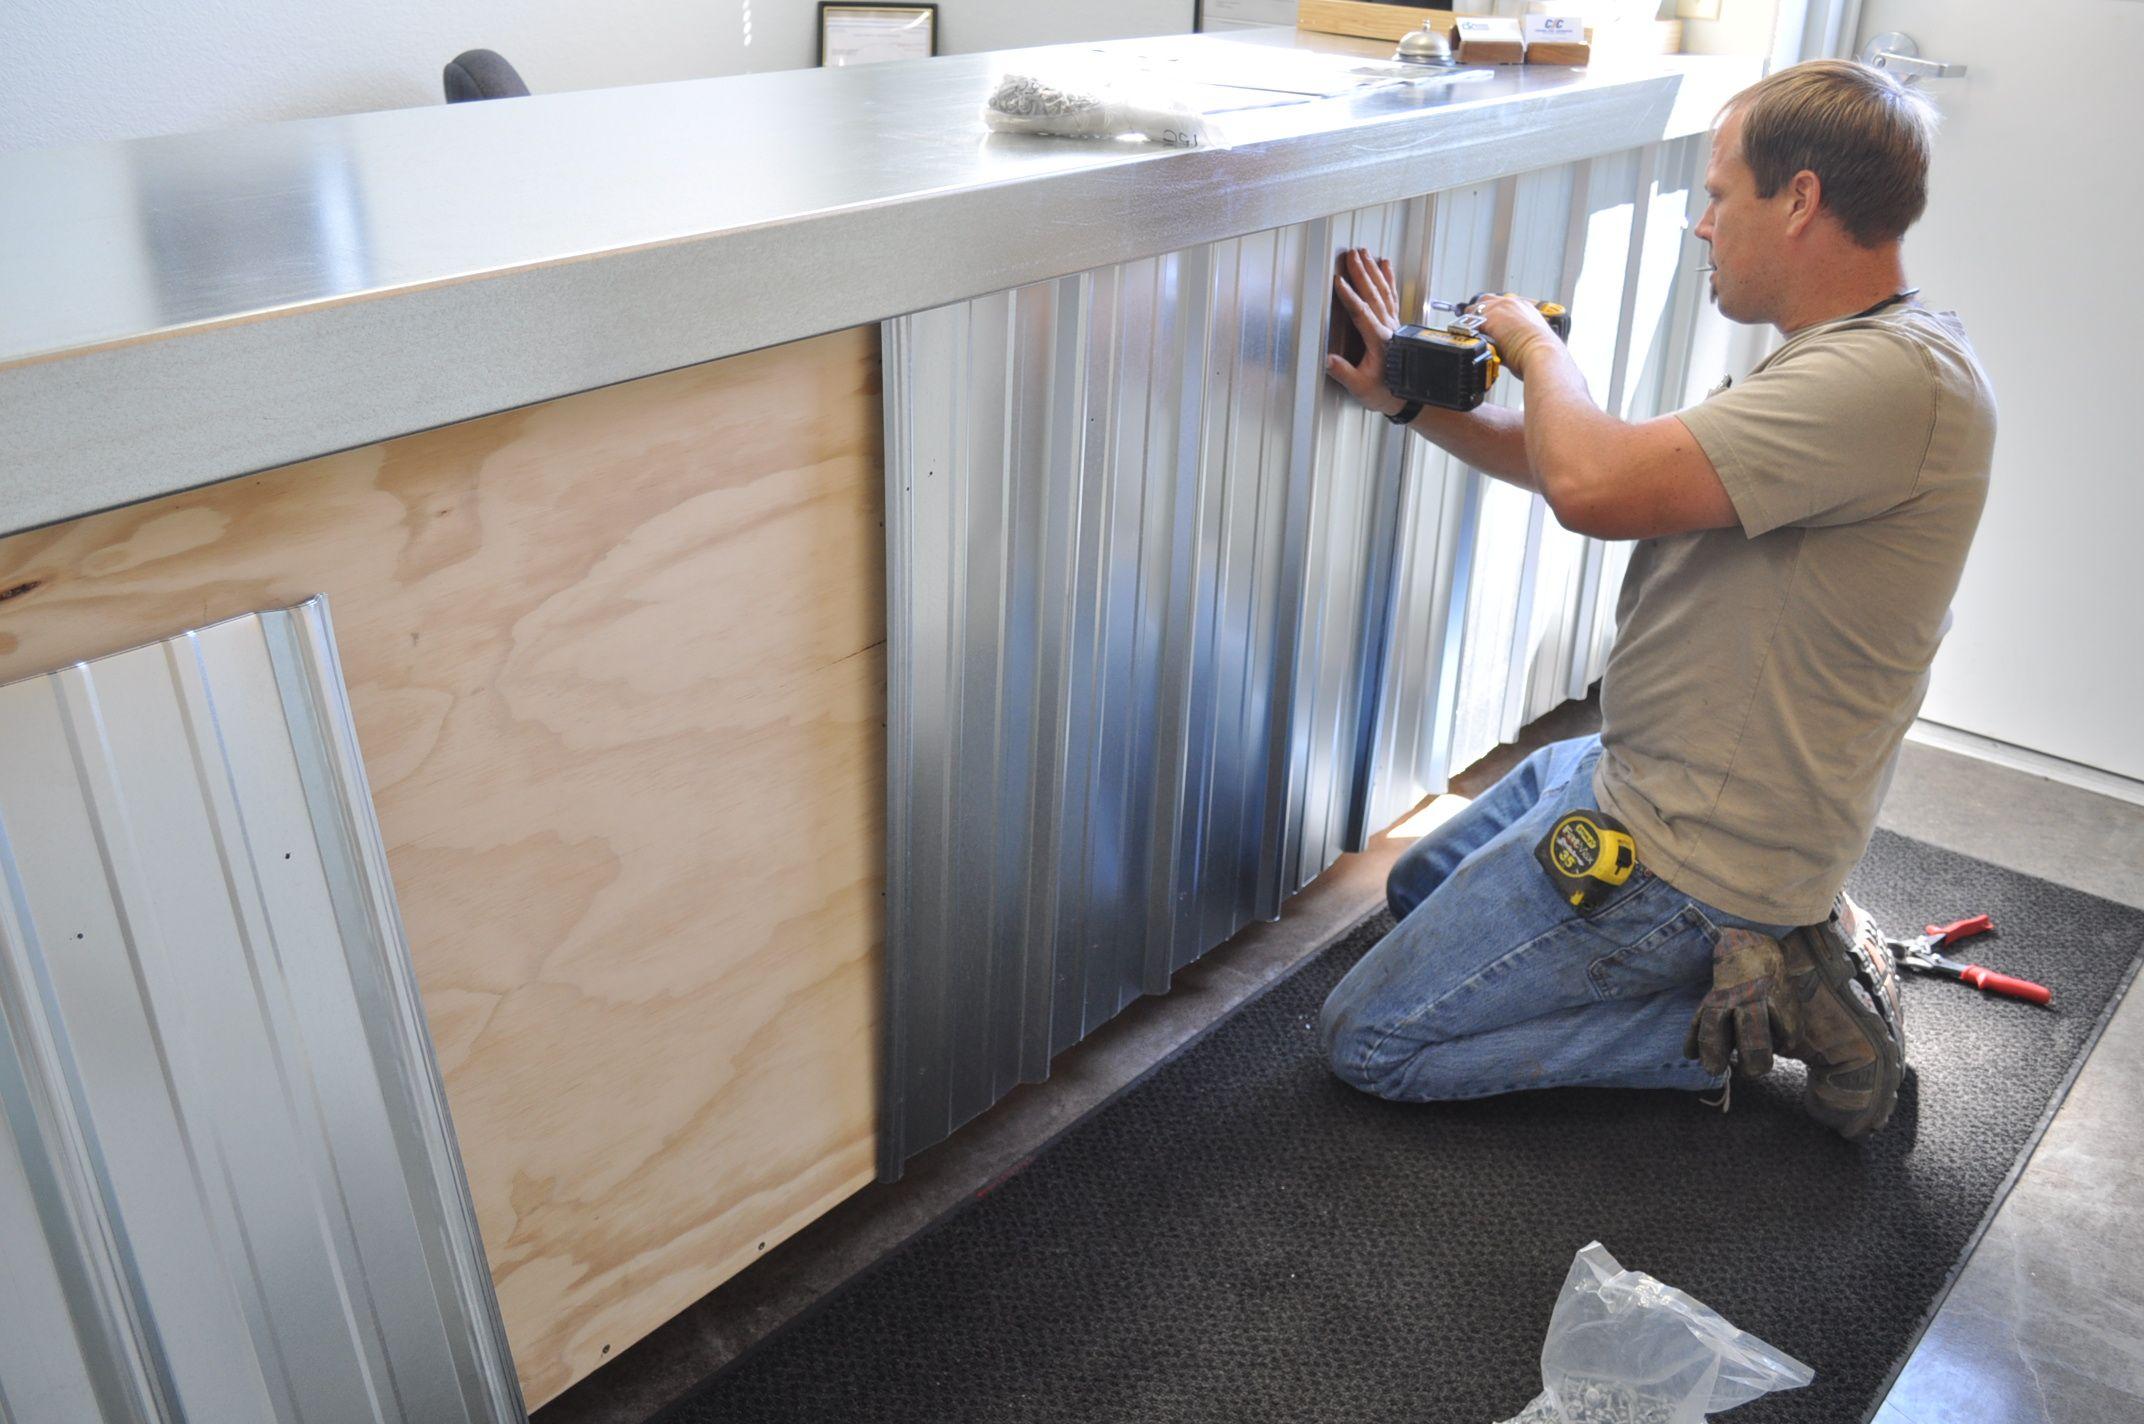 Custom Metal Counter Tops Made With Galvanized Steel Cheap Countertops Inexpensive Countertops Diy Countertops